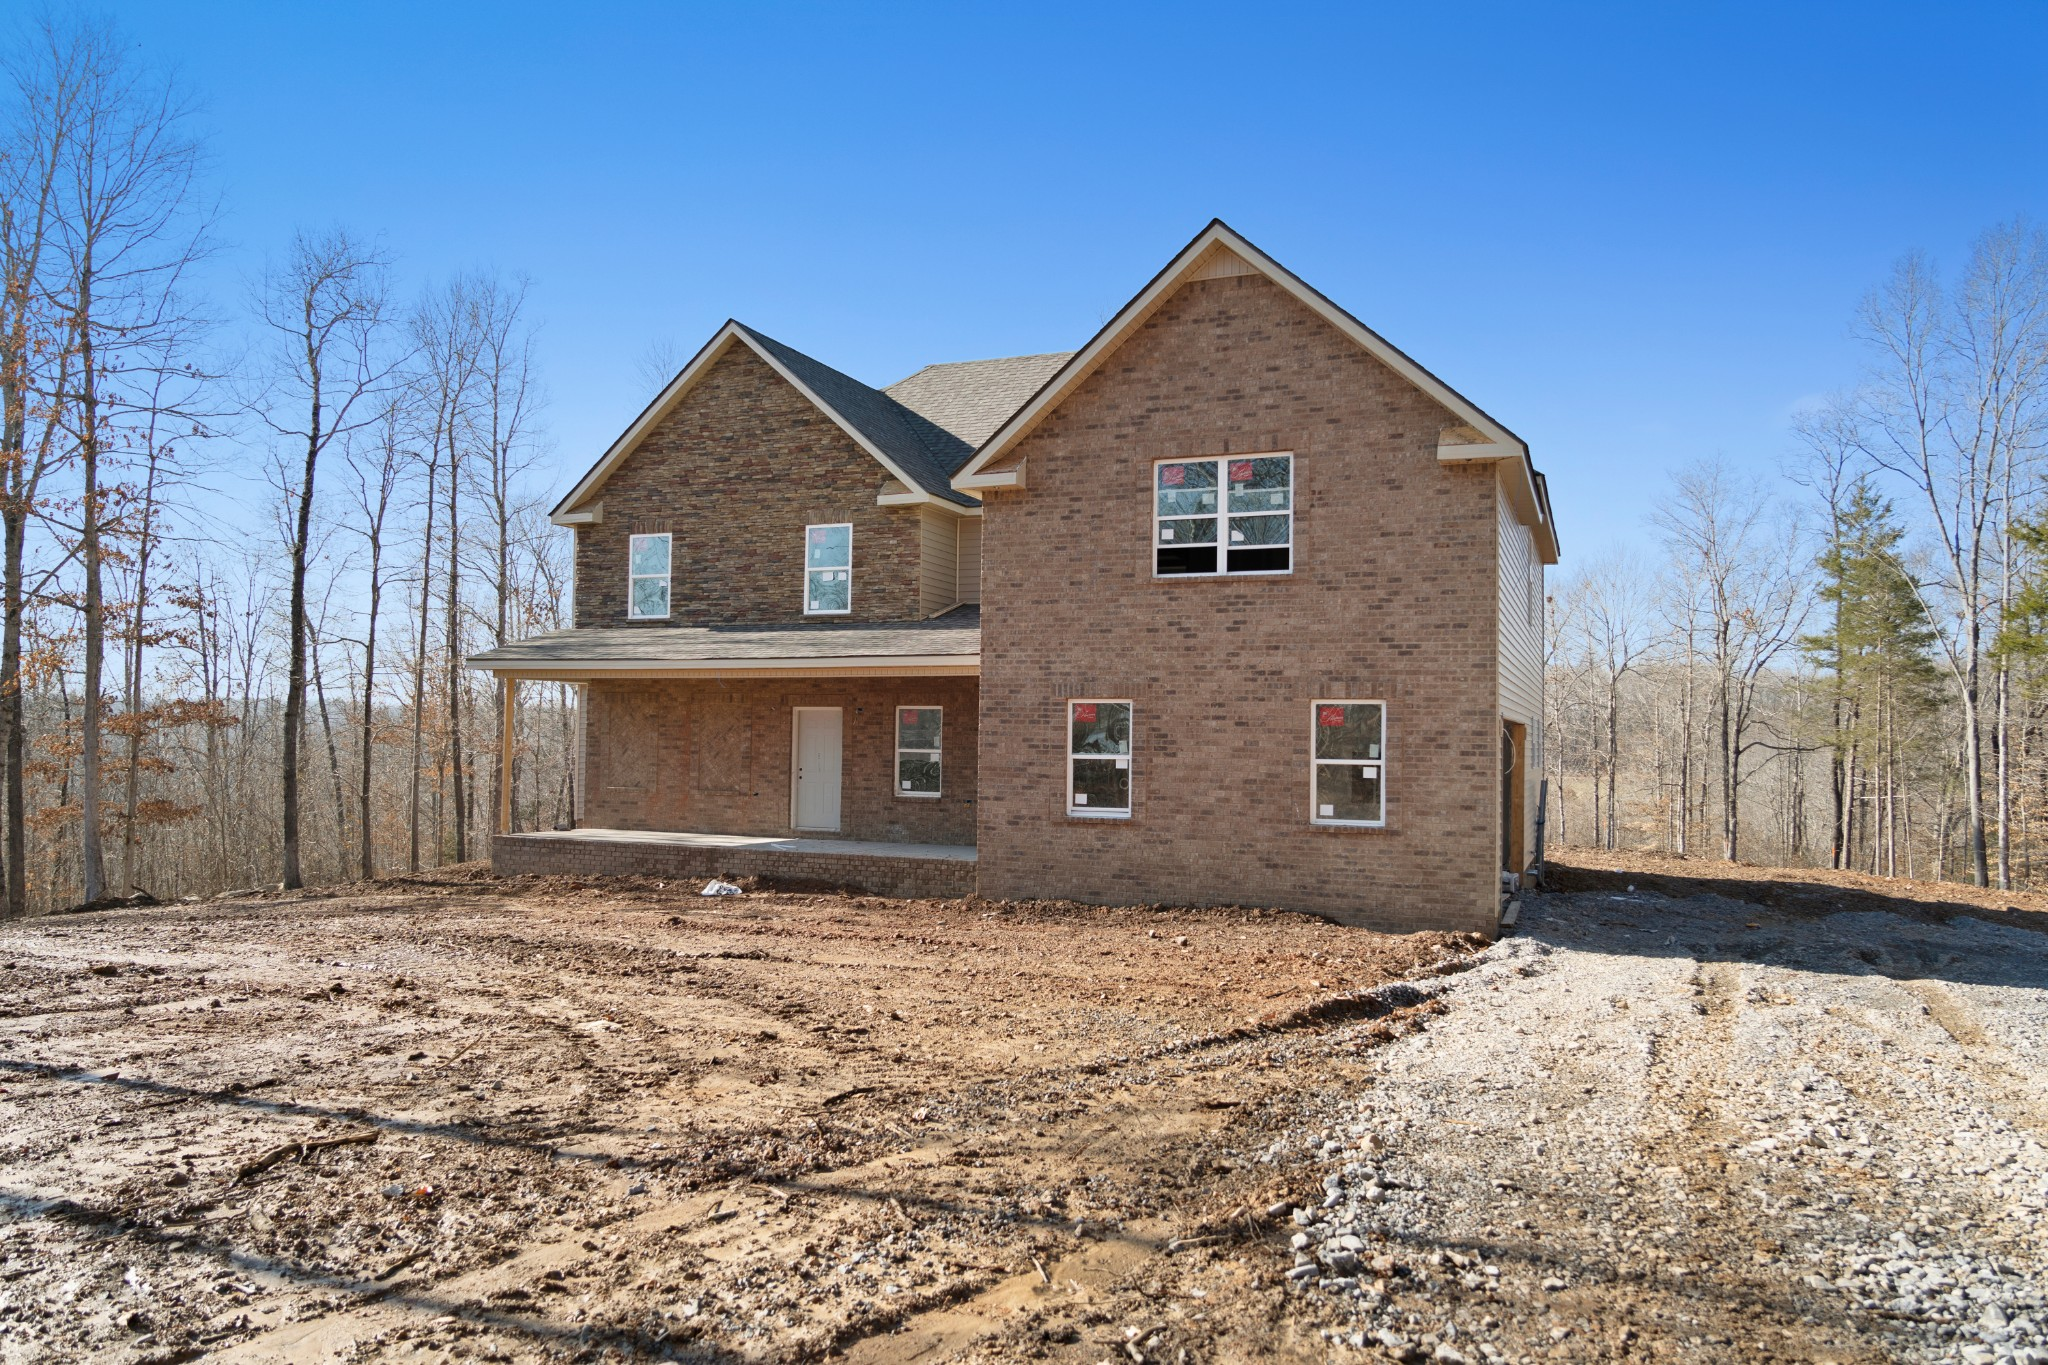 2610 Dotsonville Church Rd., Clarksville, TN 37042 - Clarksville, TN real estate listing